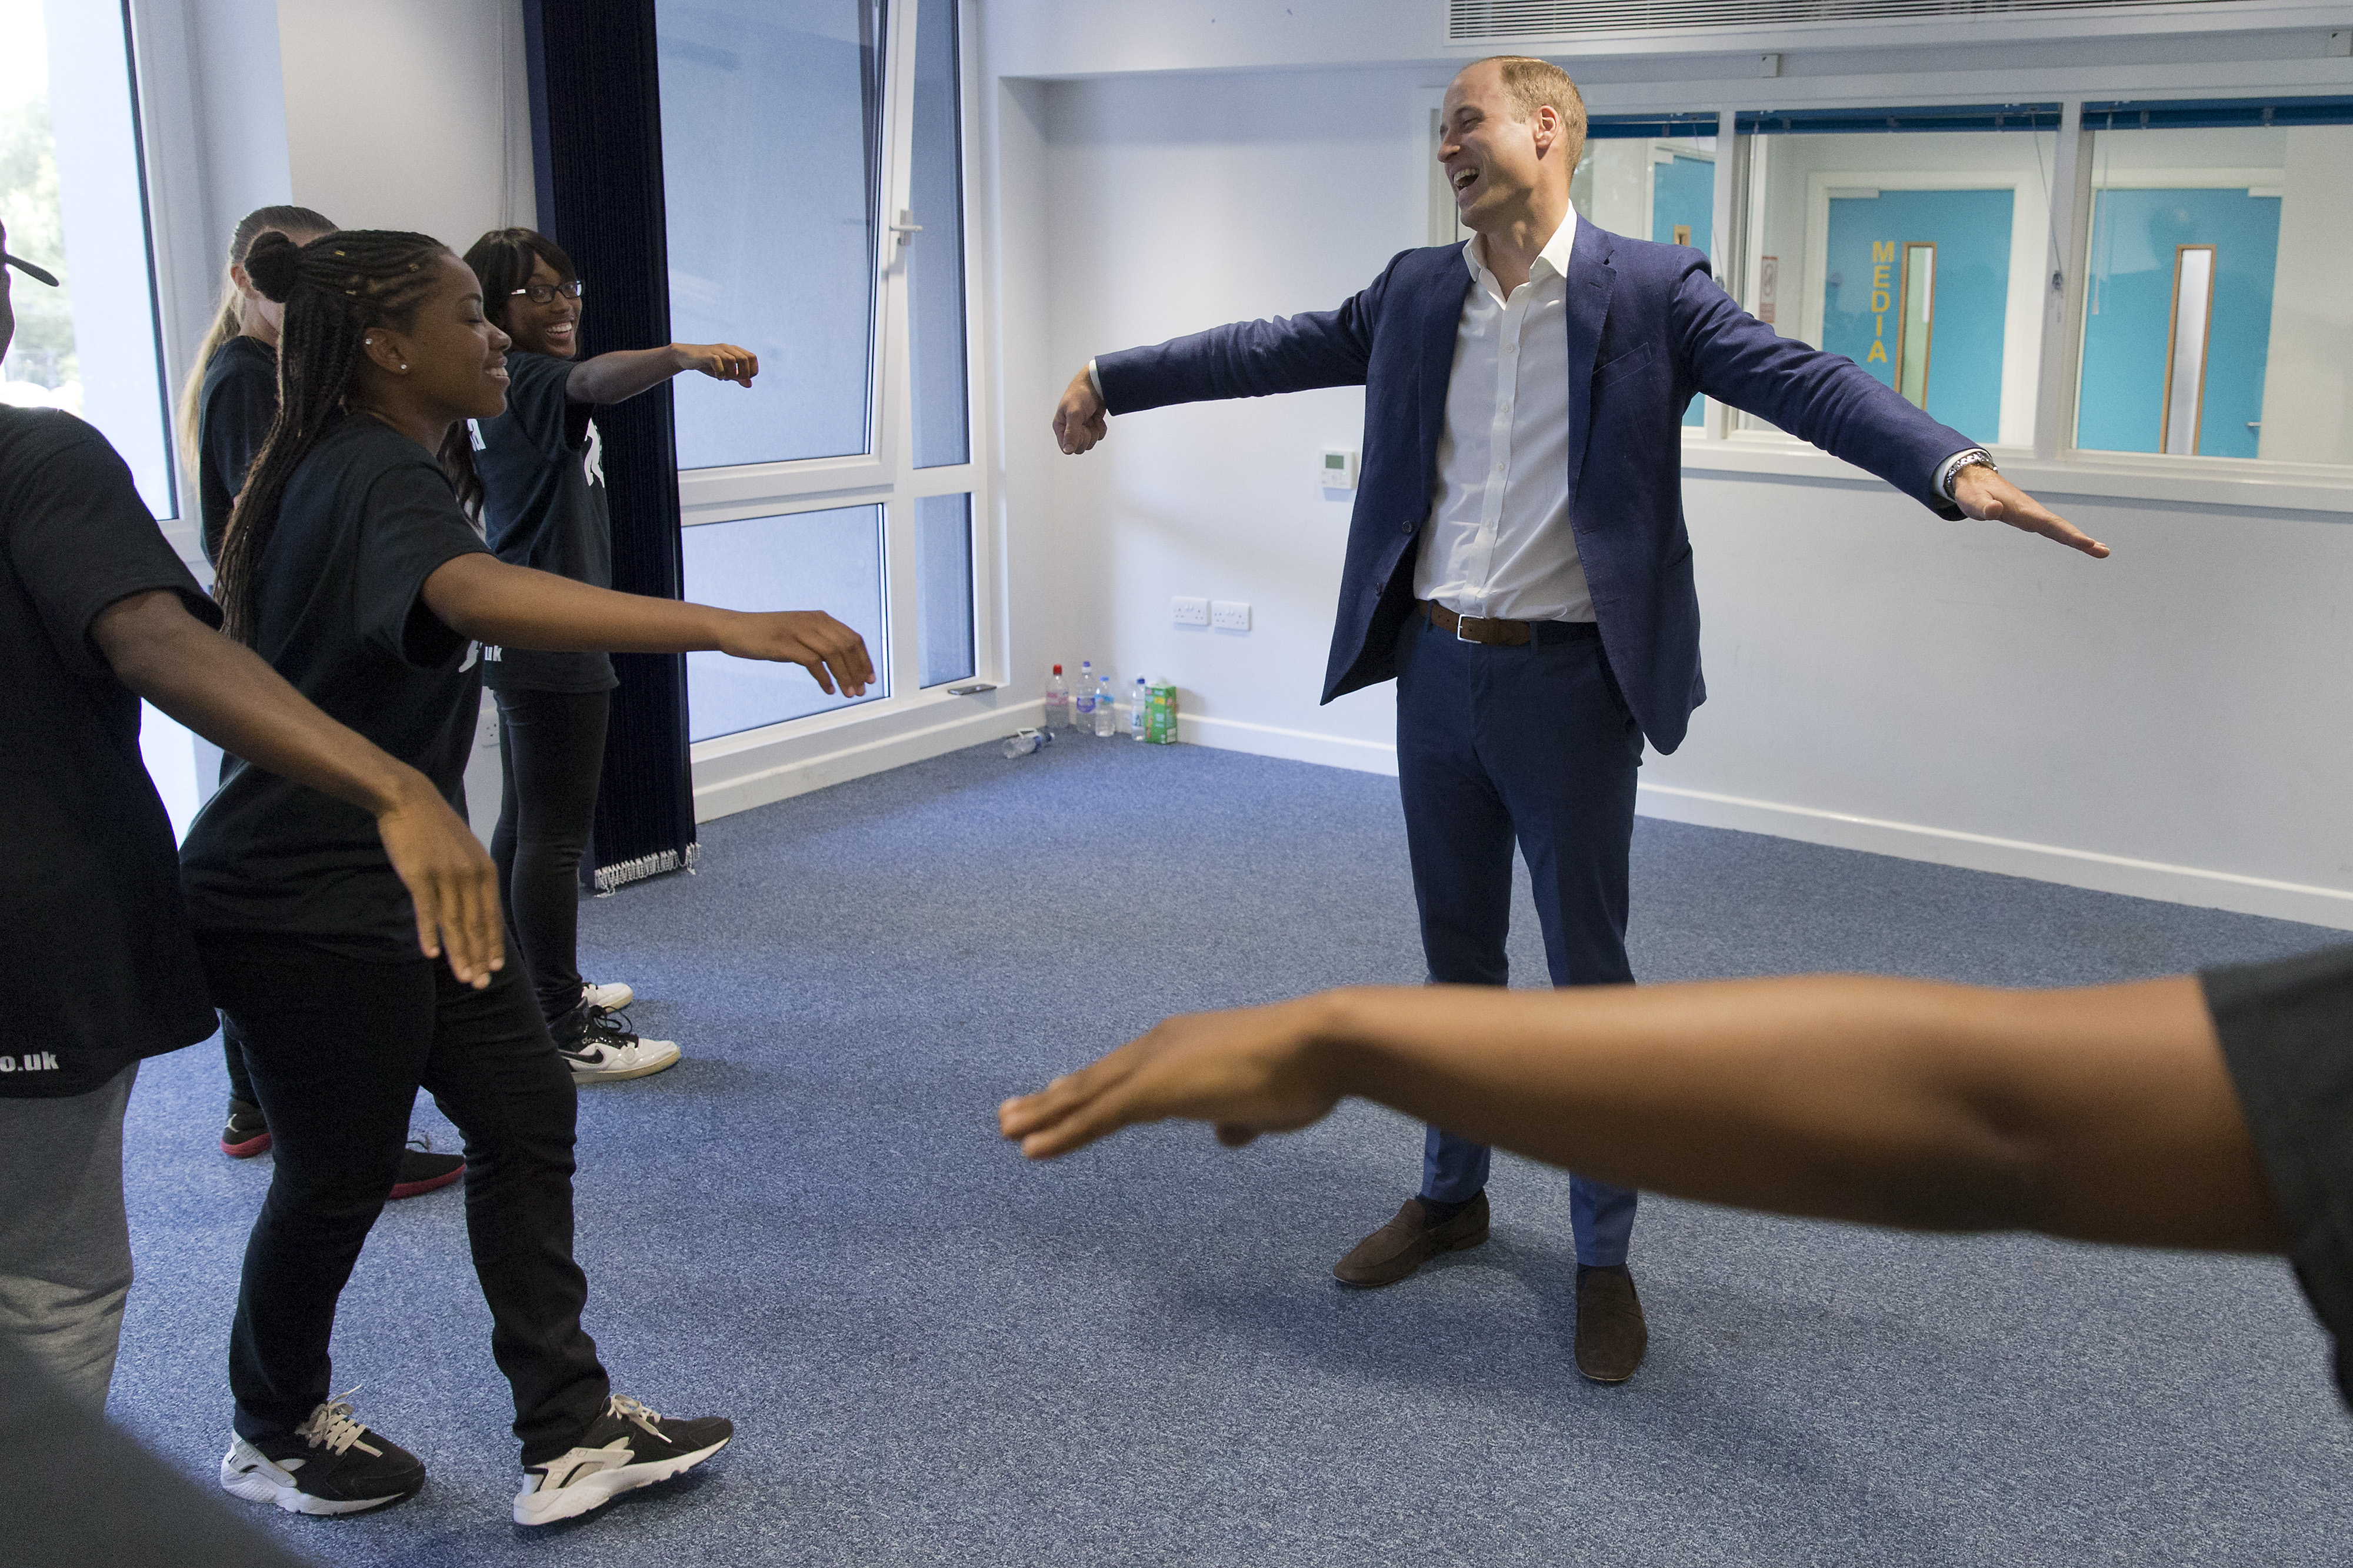 Prince William dancing on Royal visit